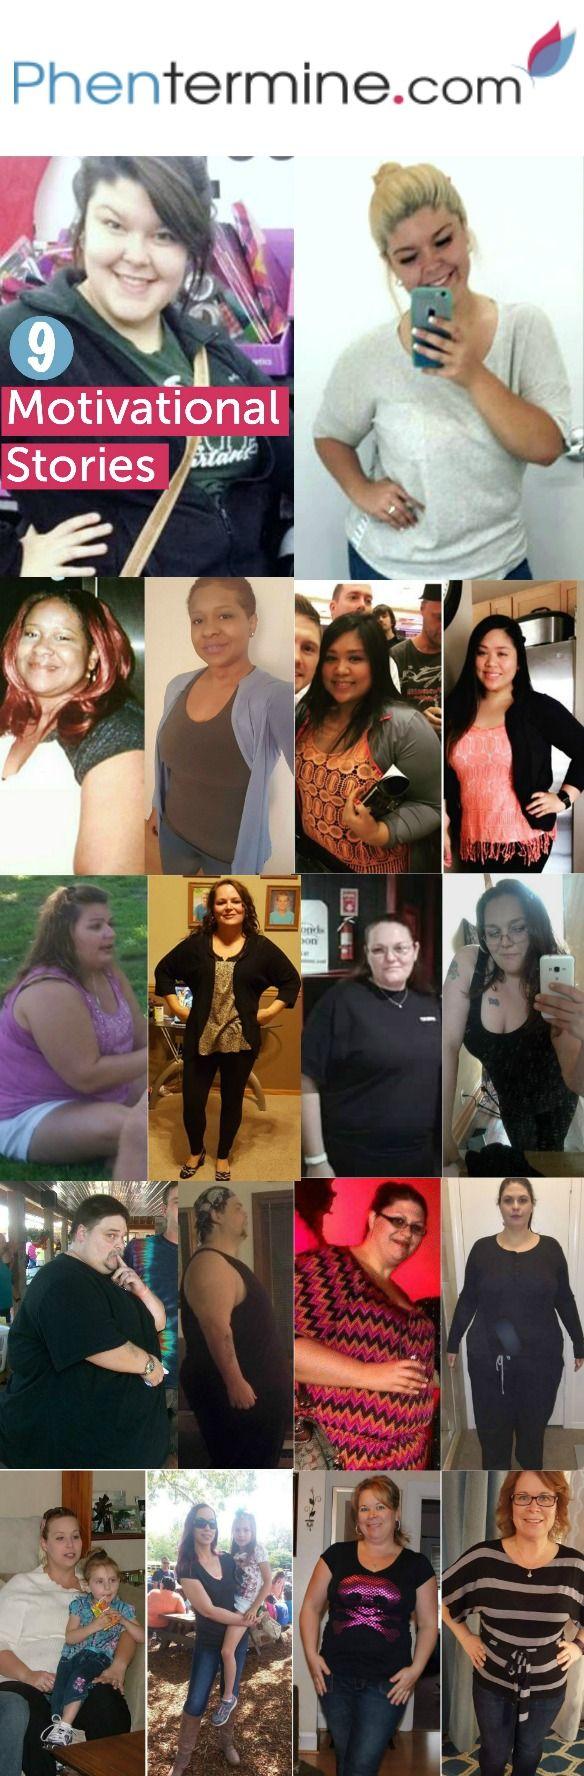 Phentermine success stories 2014